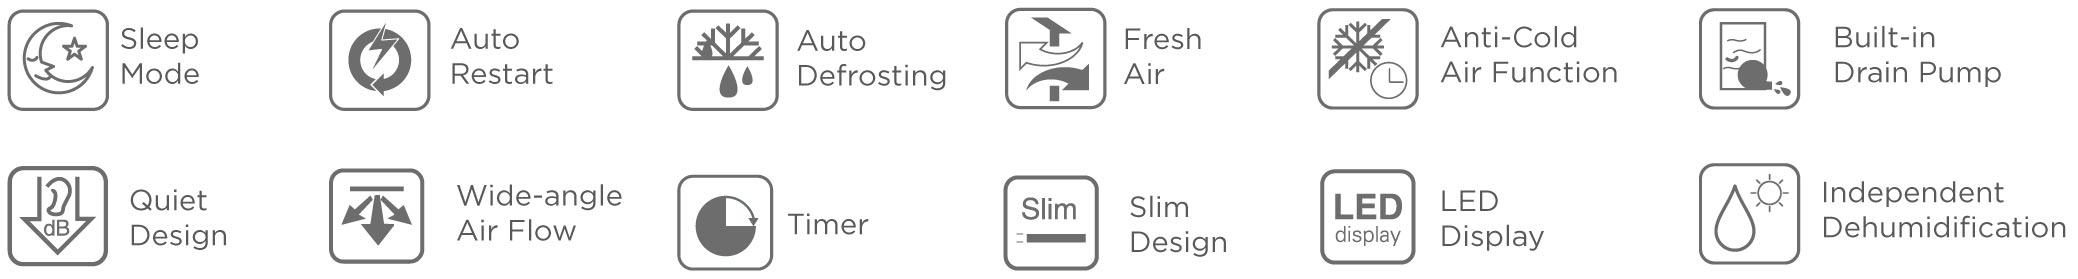 Slimline-4-way-Cassette-DC-Inverter-3